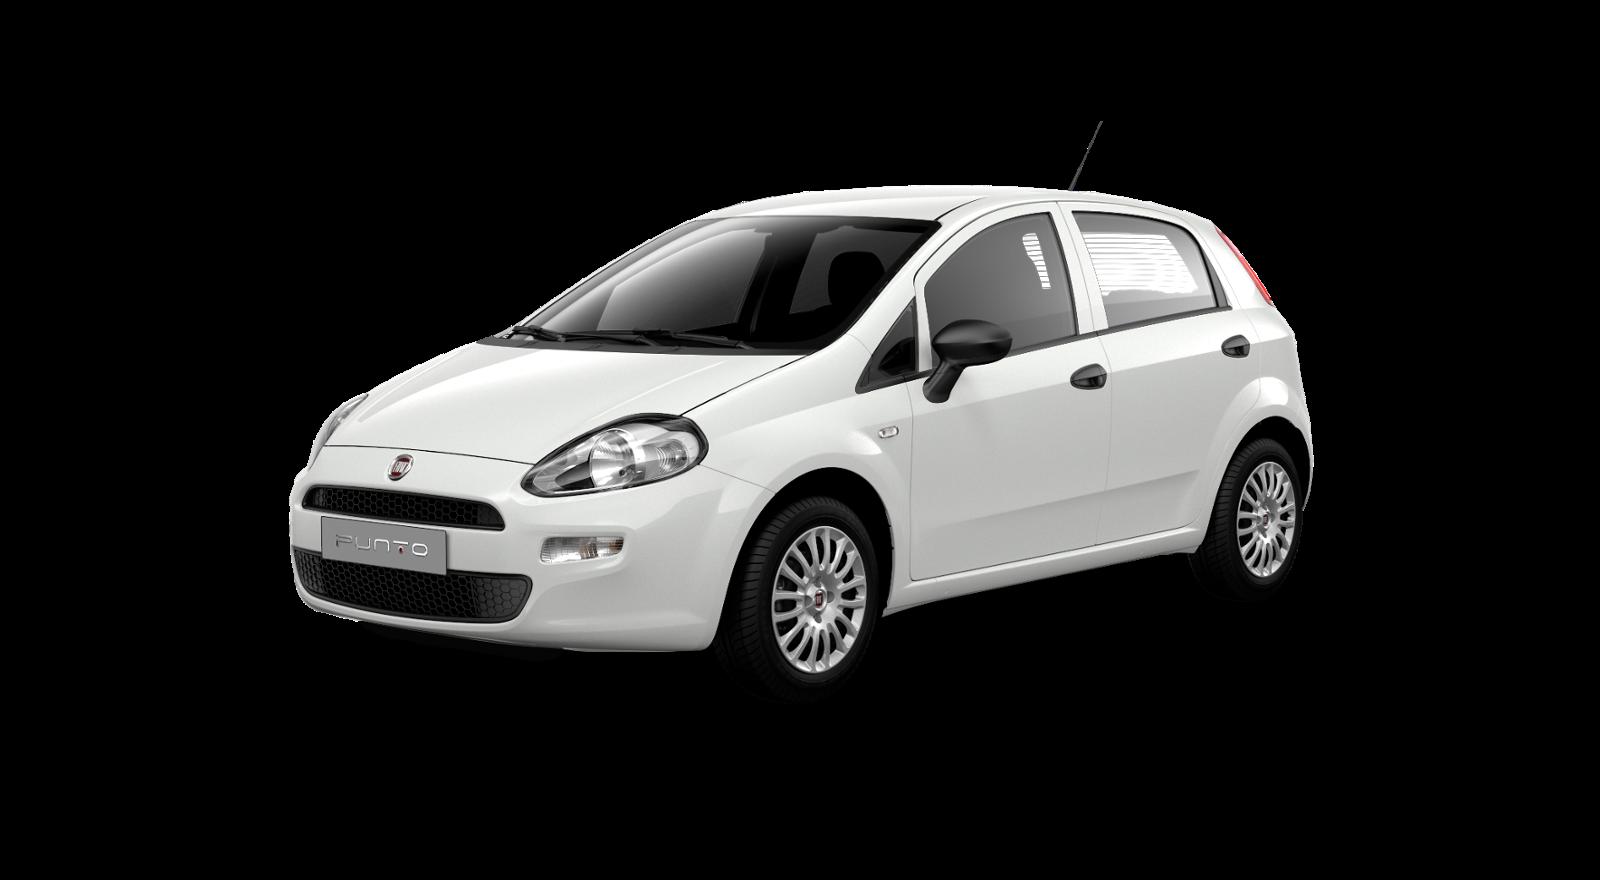 Fiat Grande Punto (05-) (199)